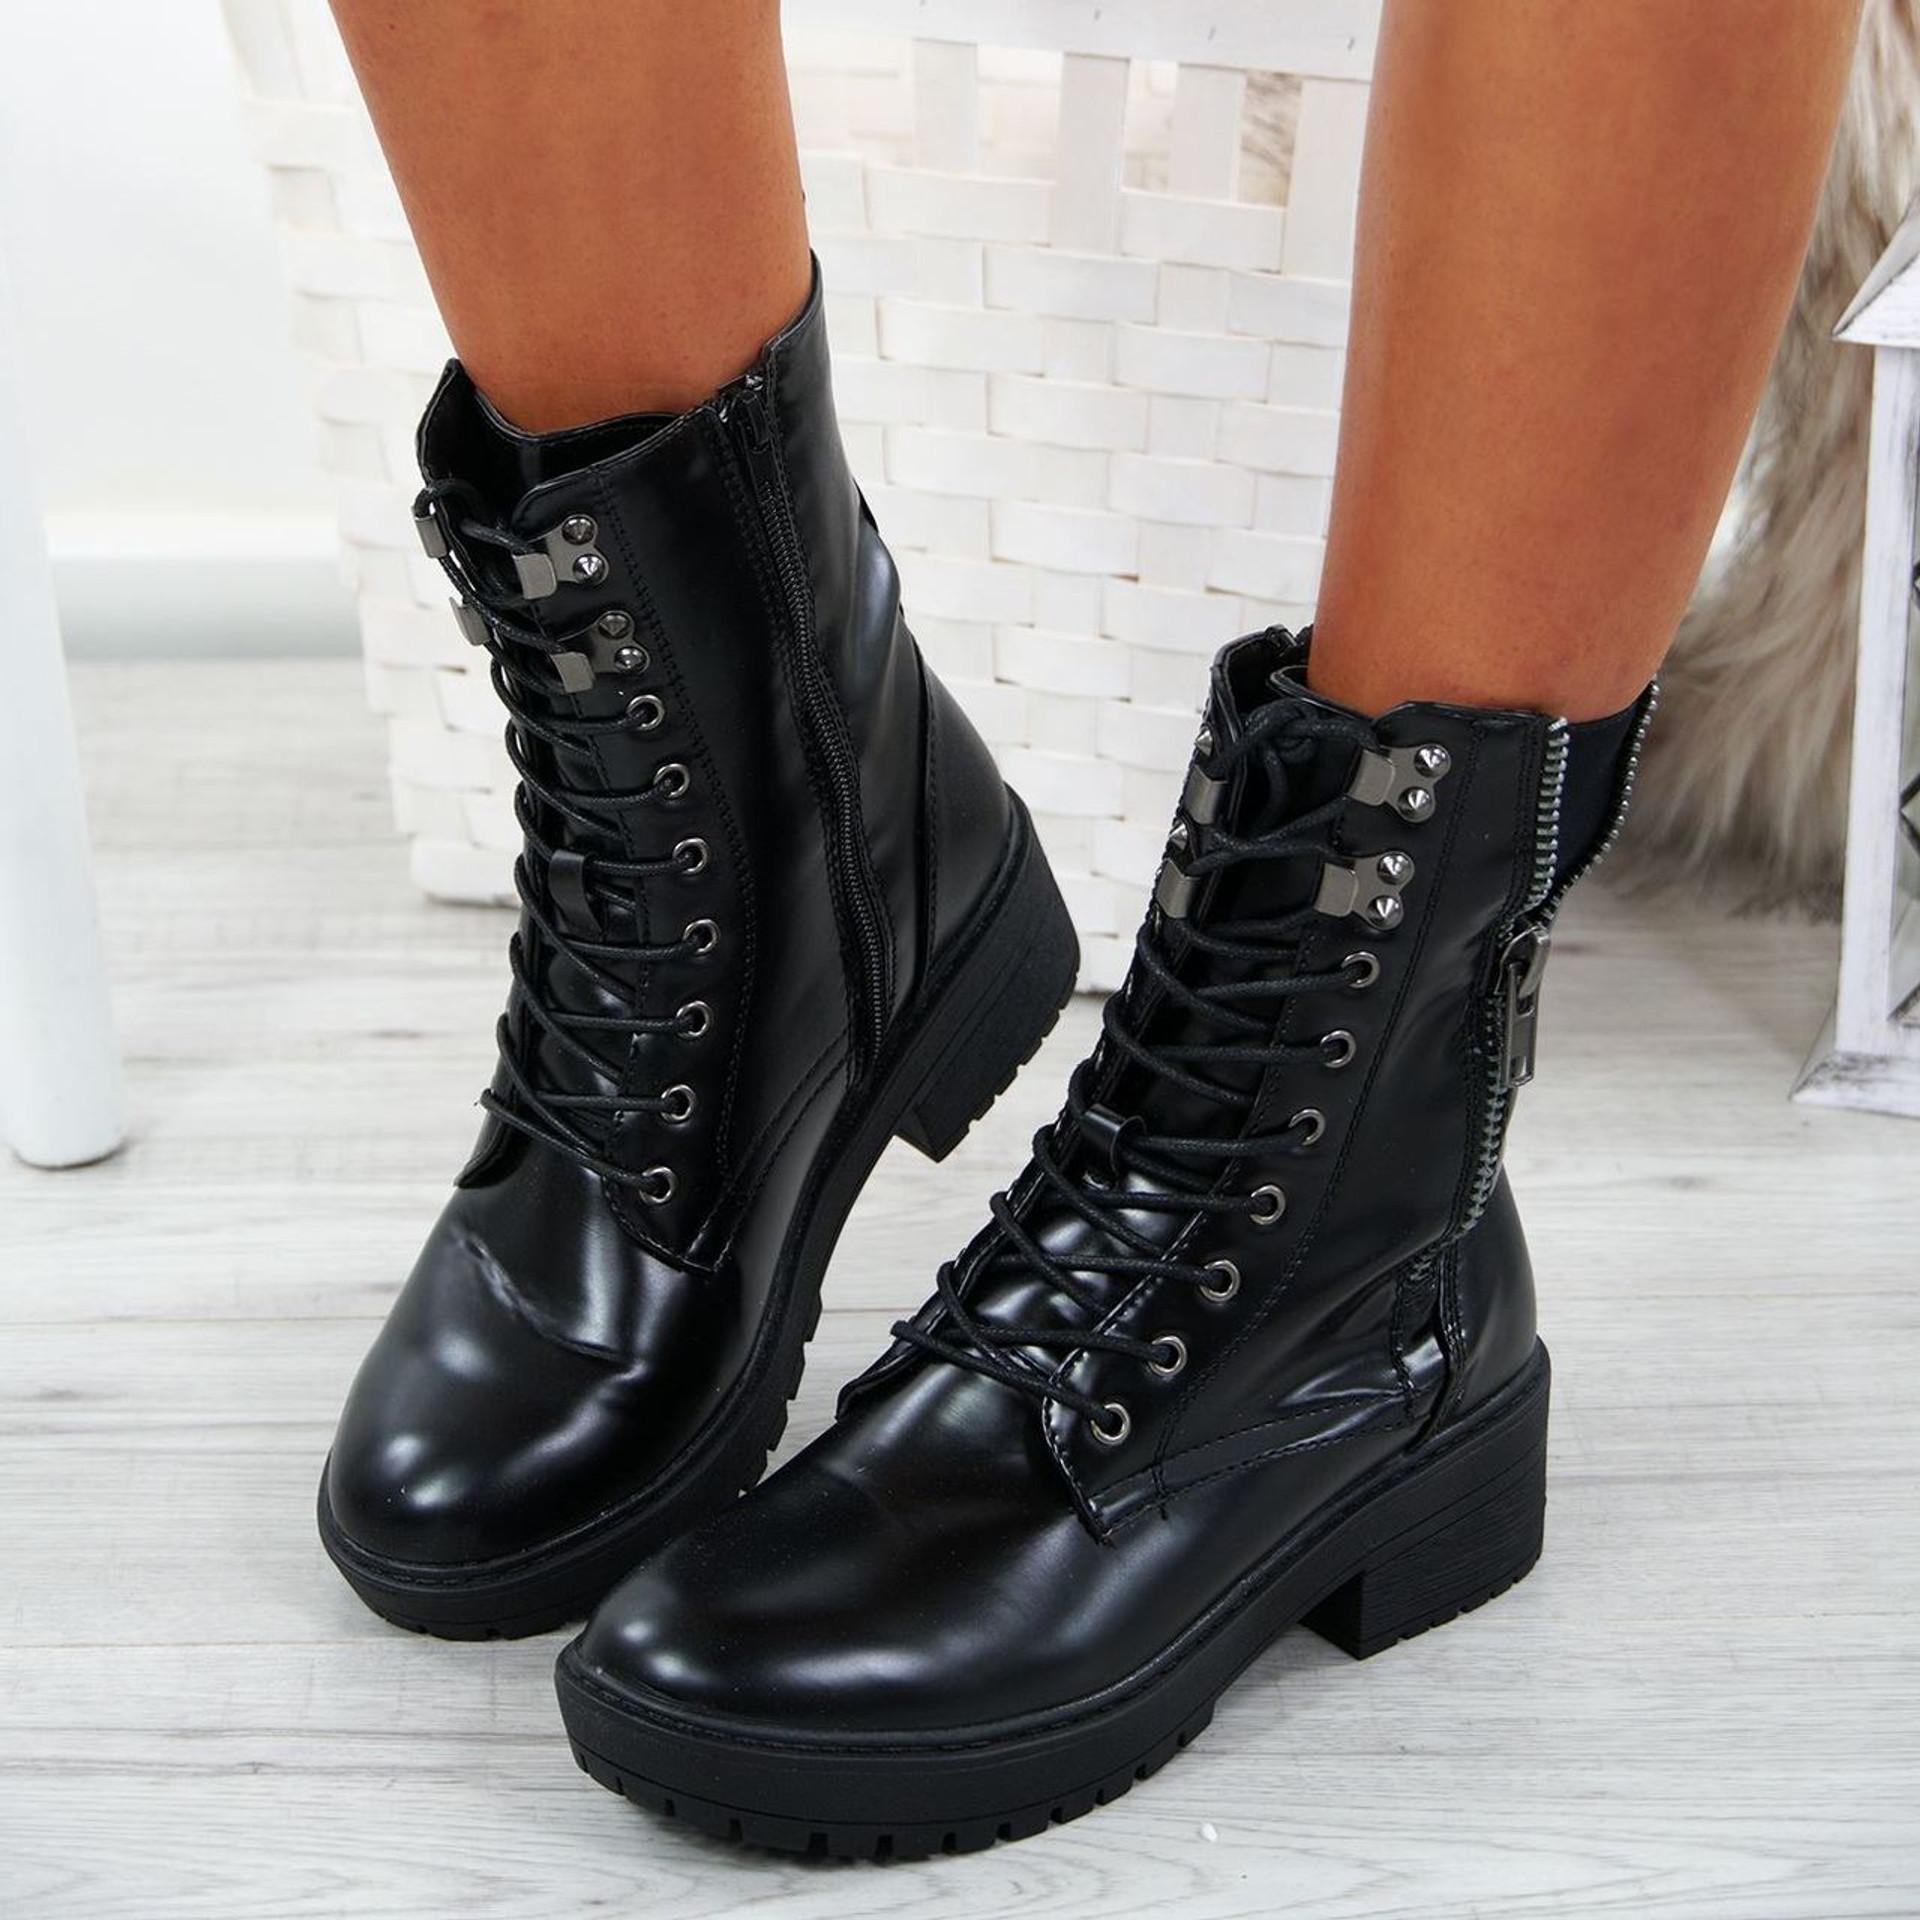 Ciarra Black Biker Ankle Boots